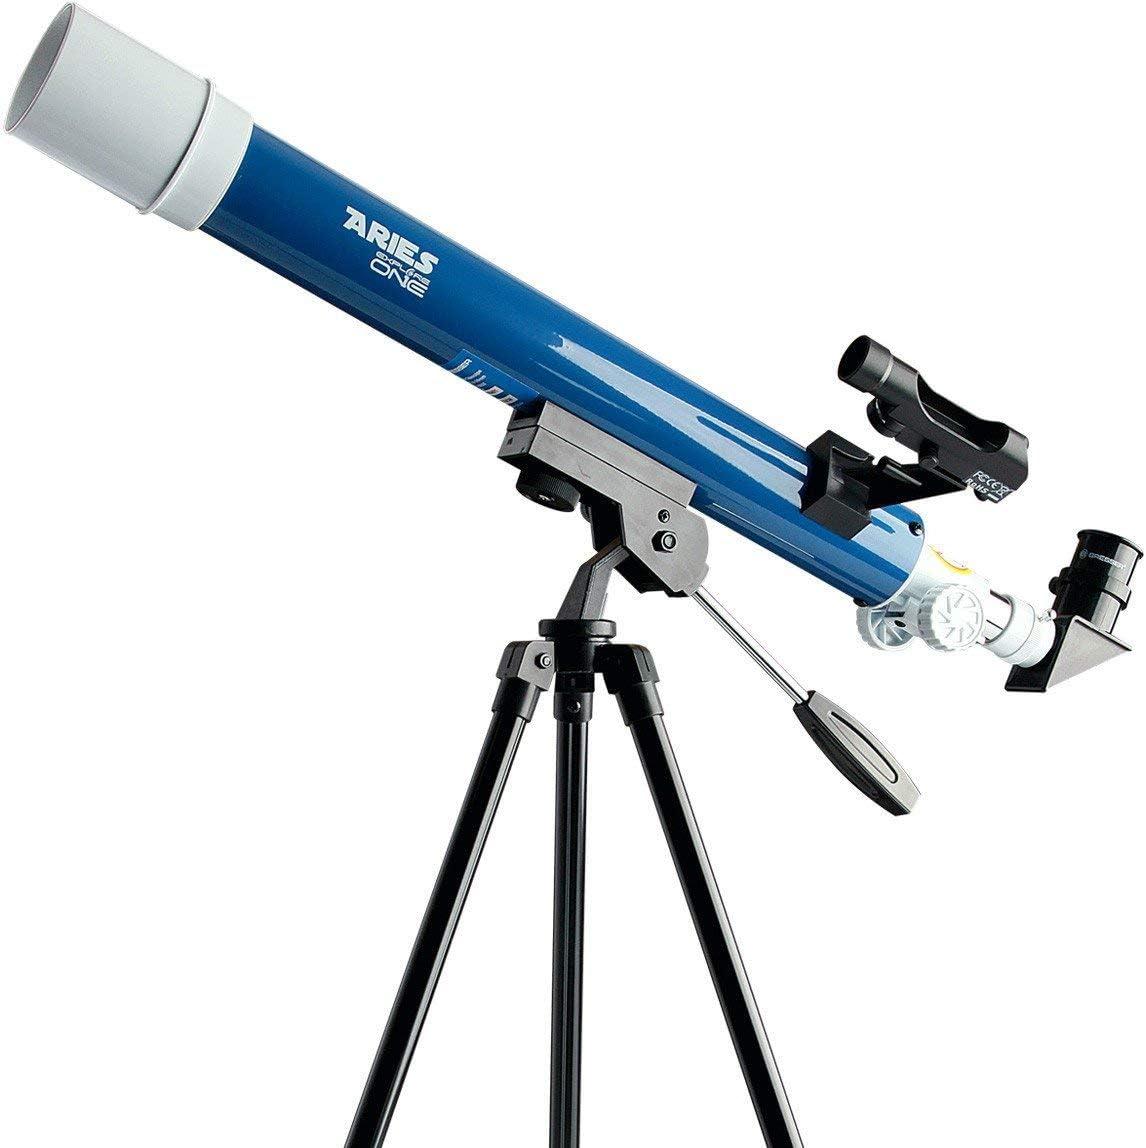 Explore Scientific 88-20114 Aurora Ii Flat Black 114Mm Slow Motion AZ Mount Telescope,